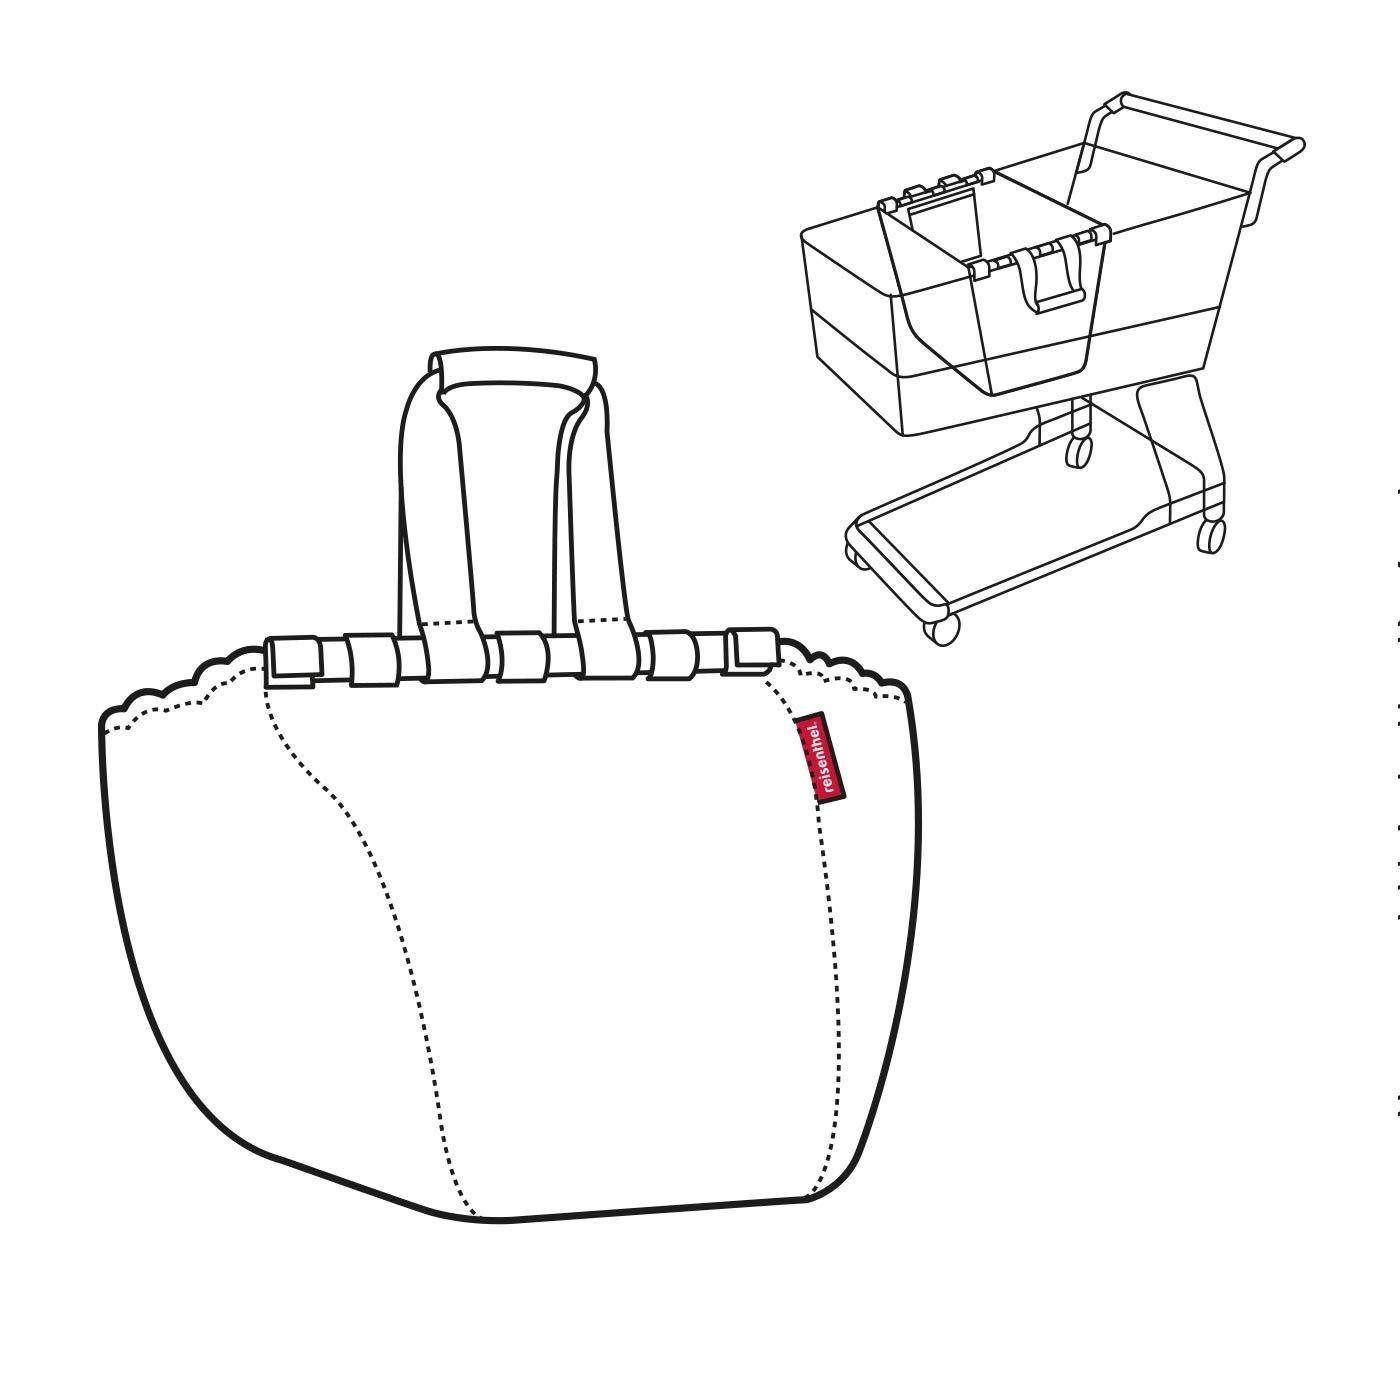 Reisenthel easyshoppingbag 2 pi/èces Sac de Courses shoppingbag easybag Artist Stripes Fifties Black